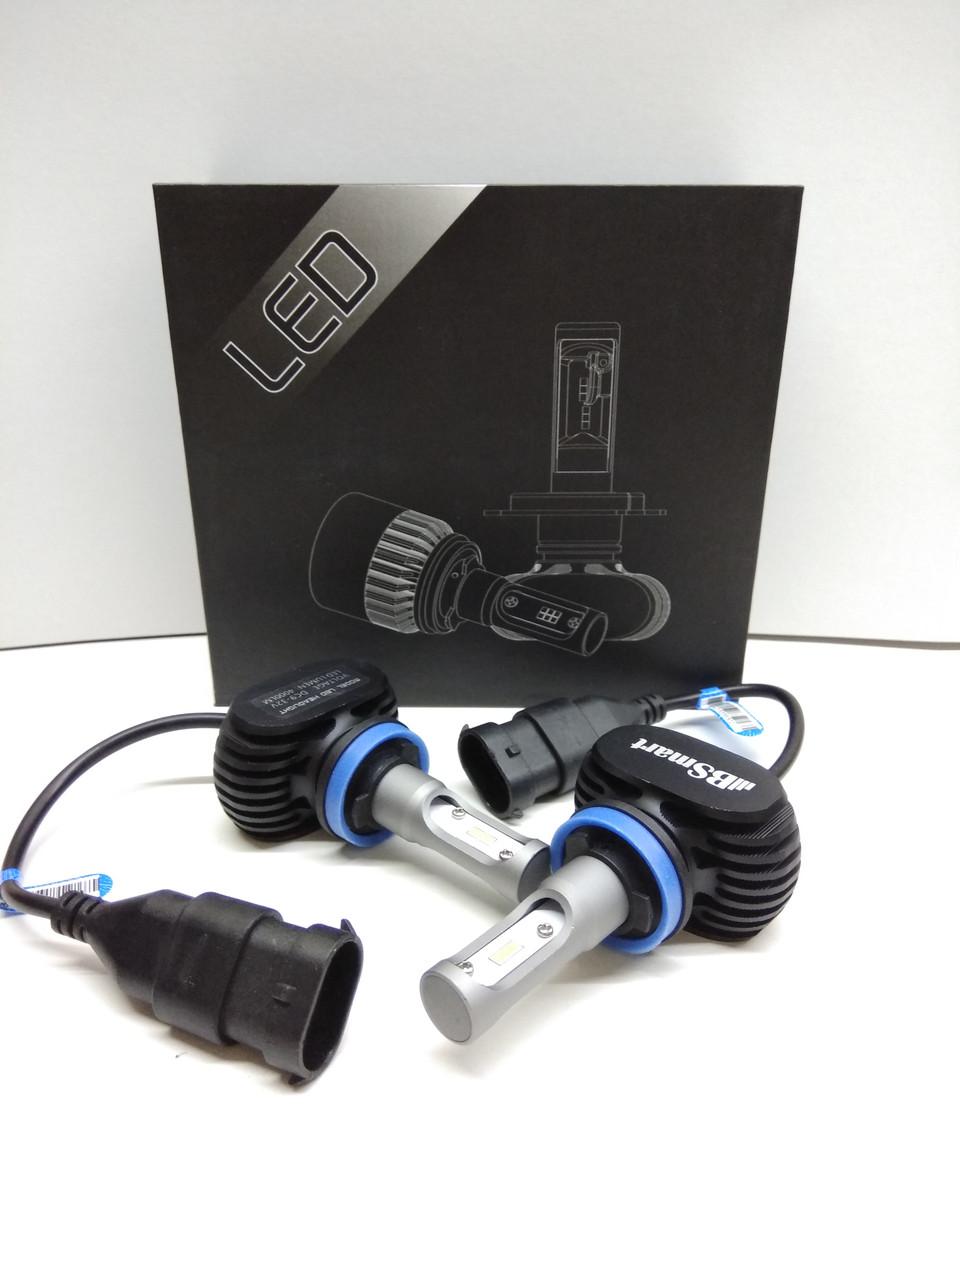 Автолампы LED S1 диод CSP Южная Корея, H16 JP, 8000LM, 50W, 9-32V